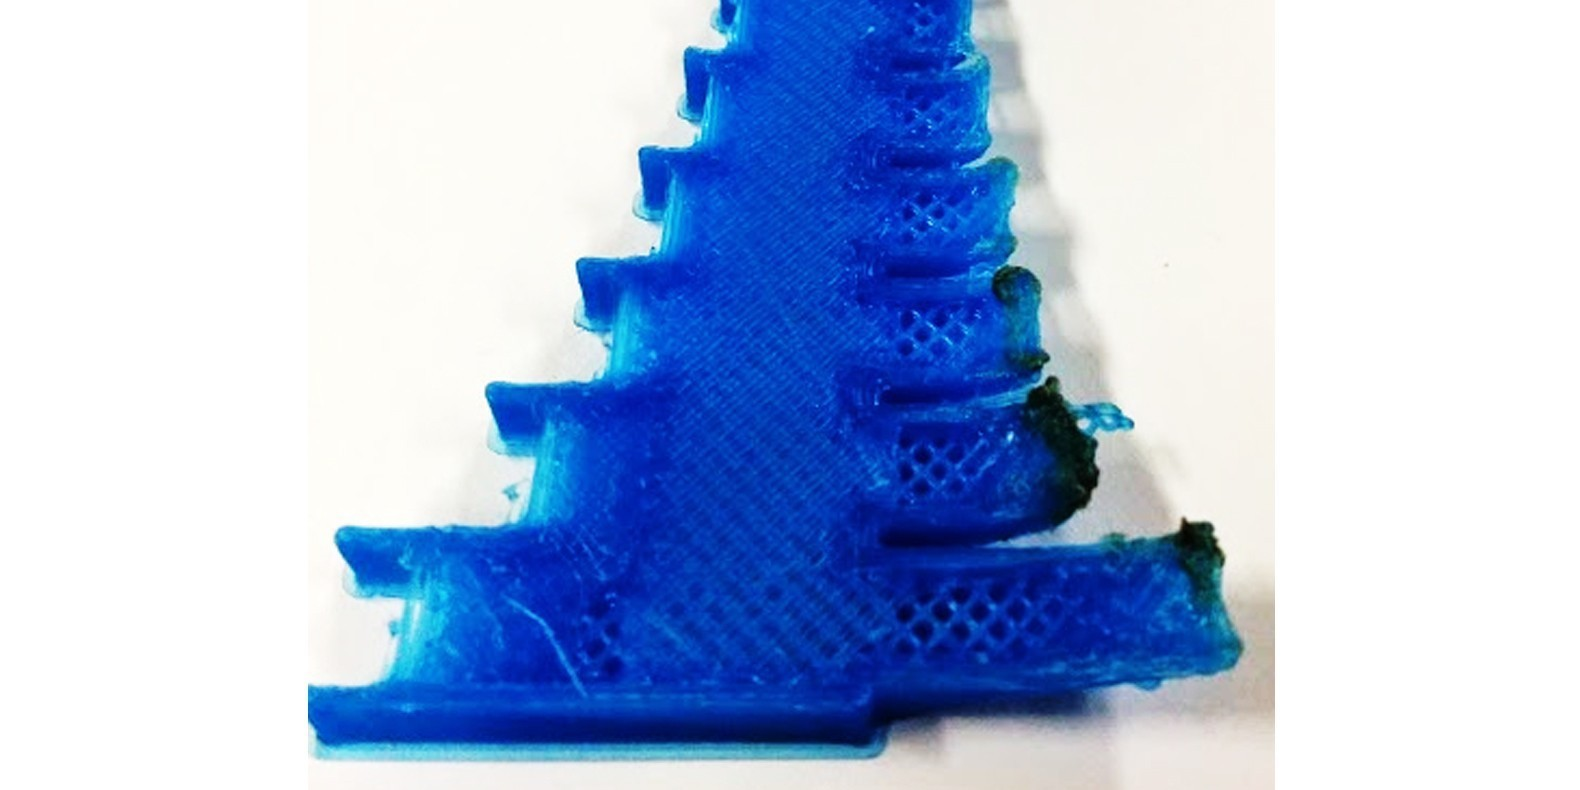 cintrage 3D printing